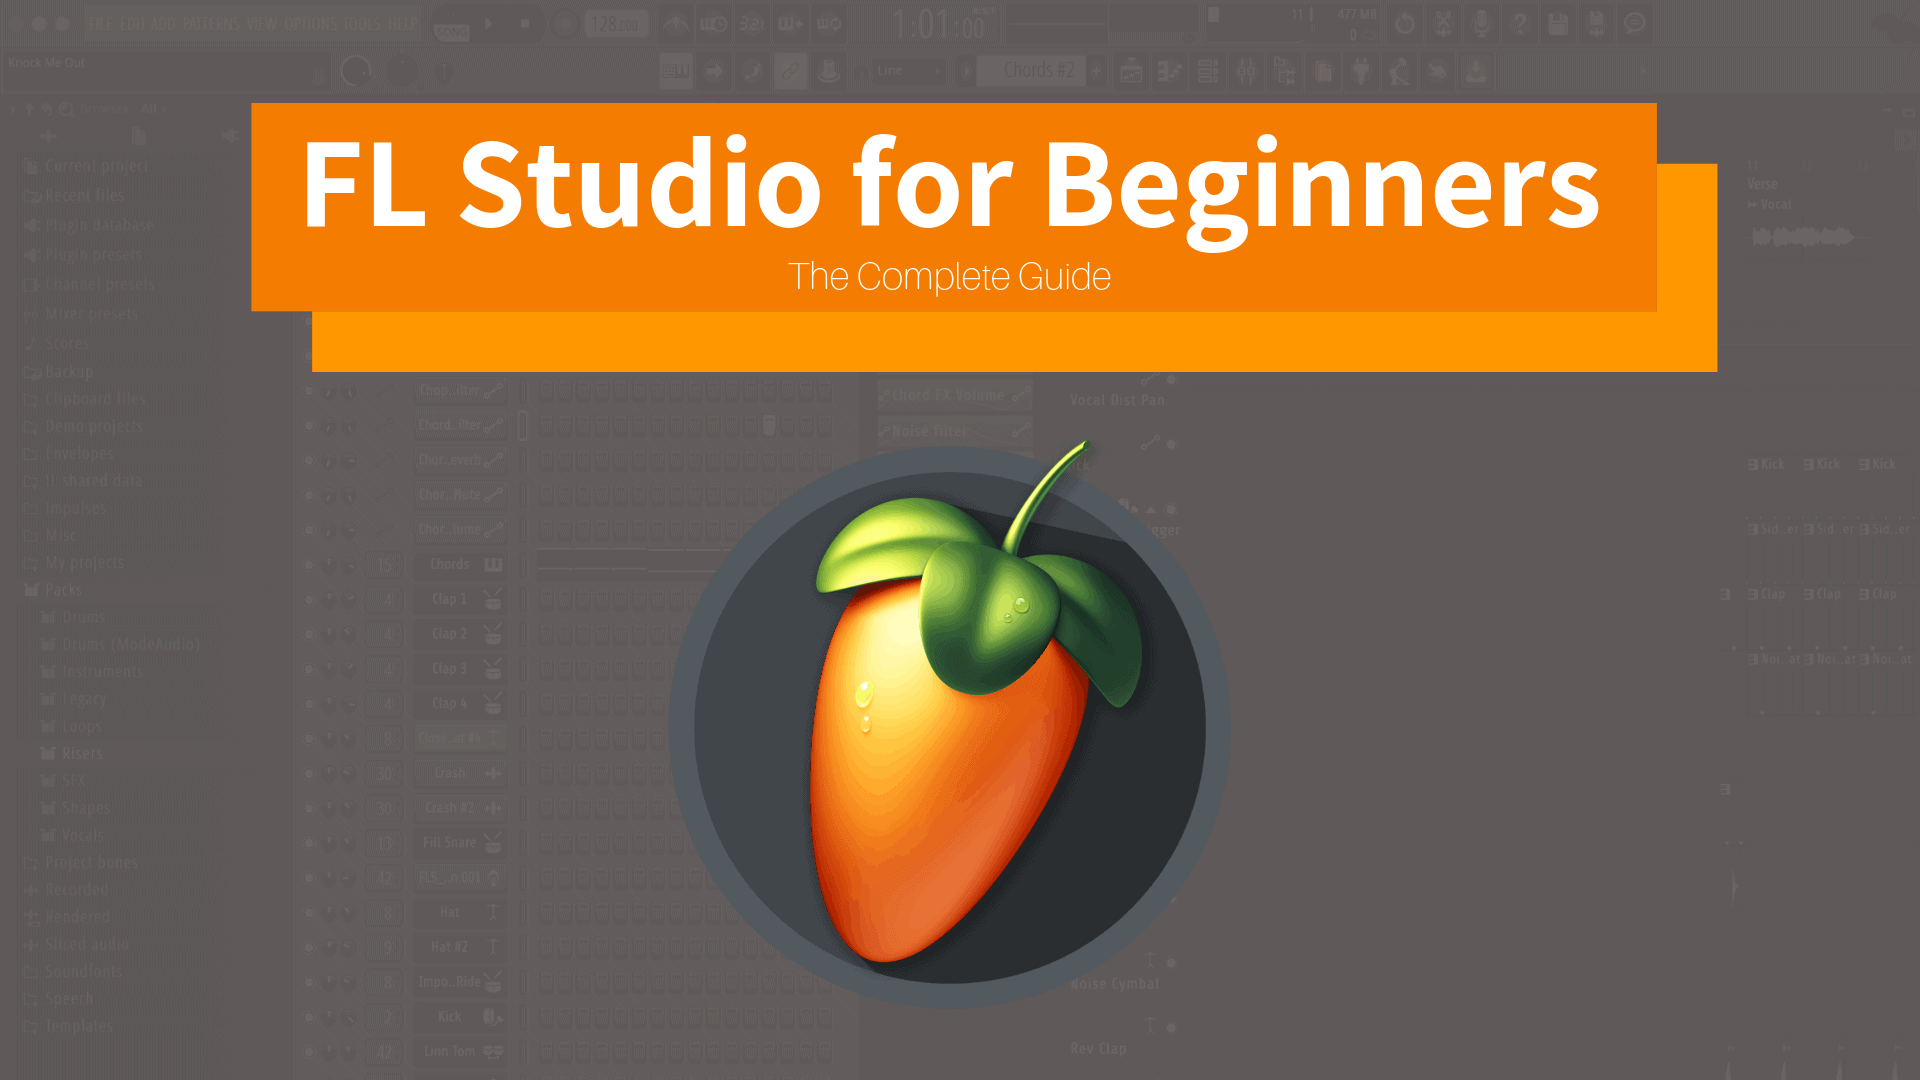 FL Studio Getting Started